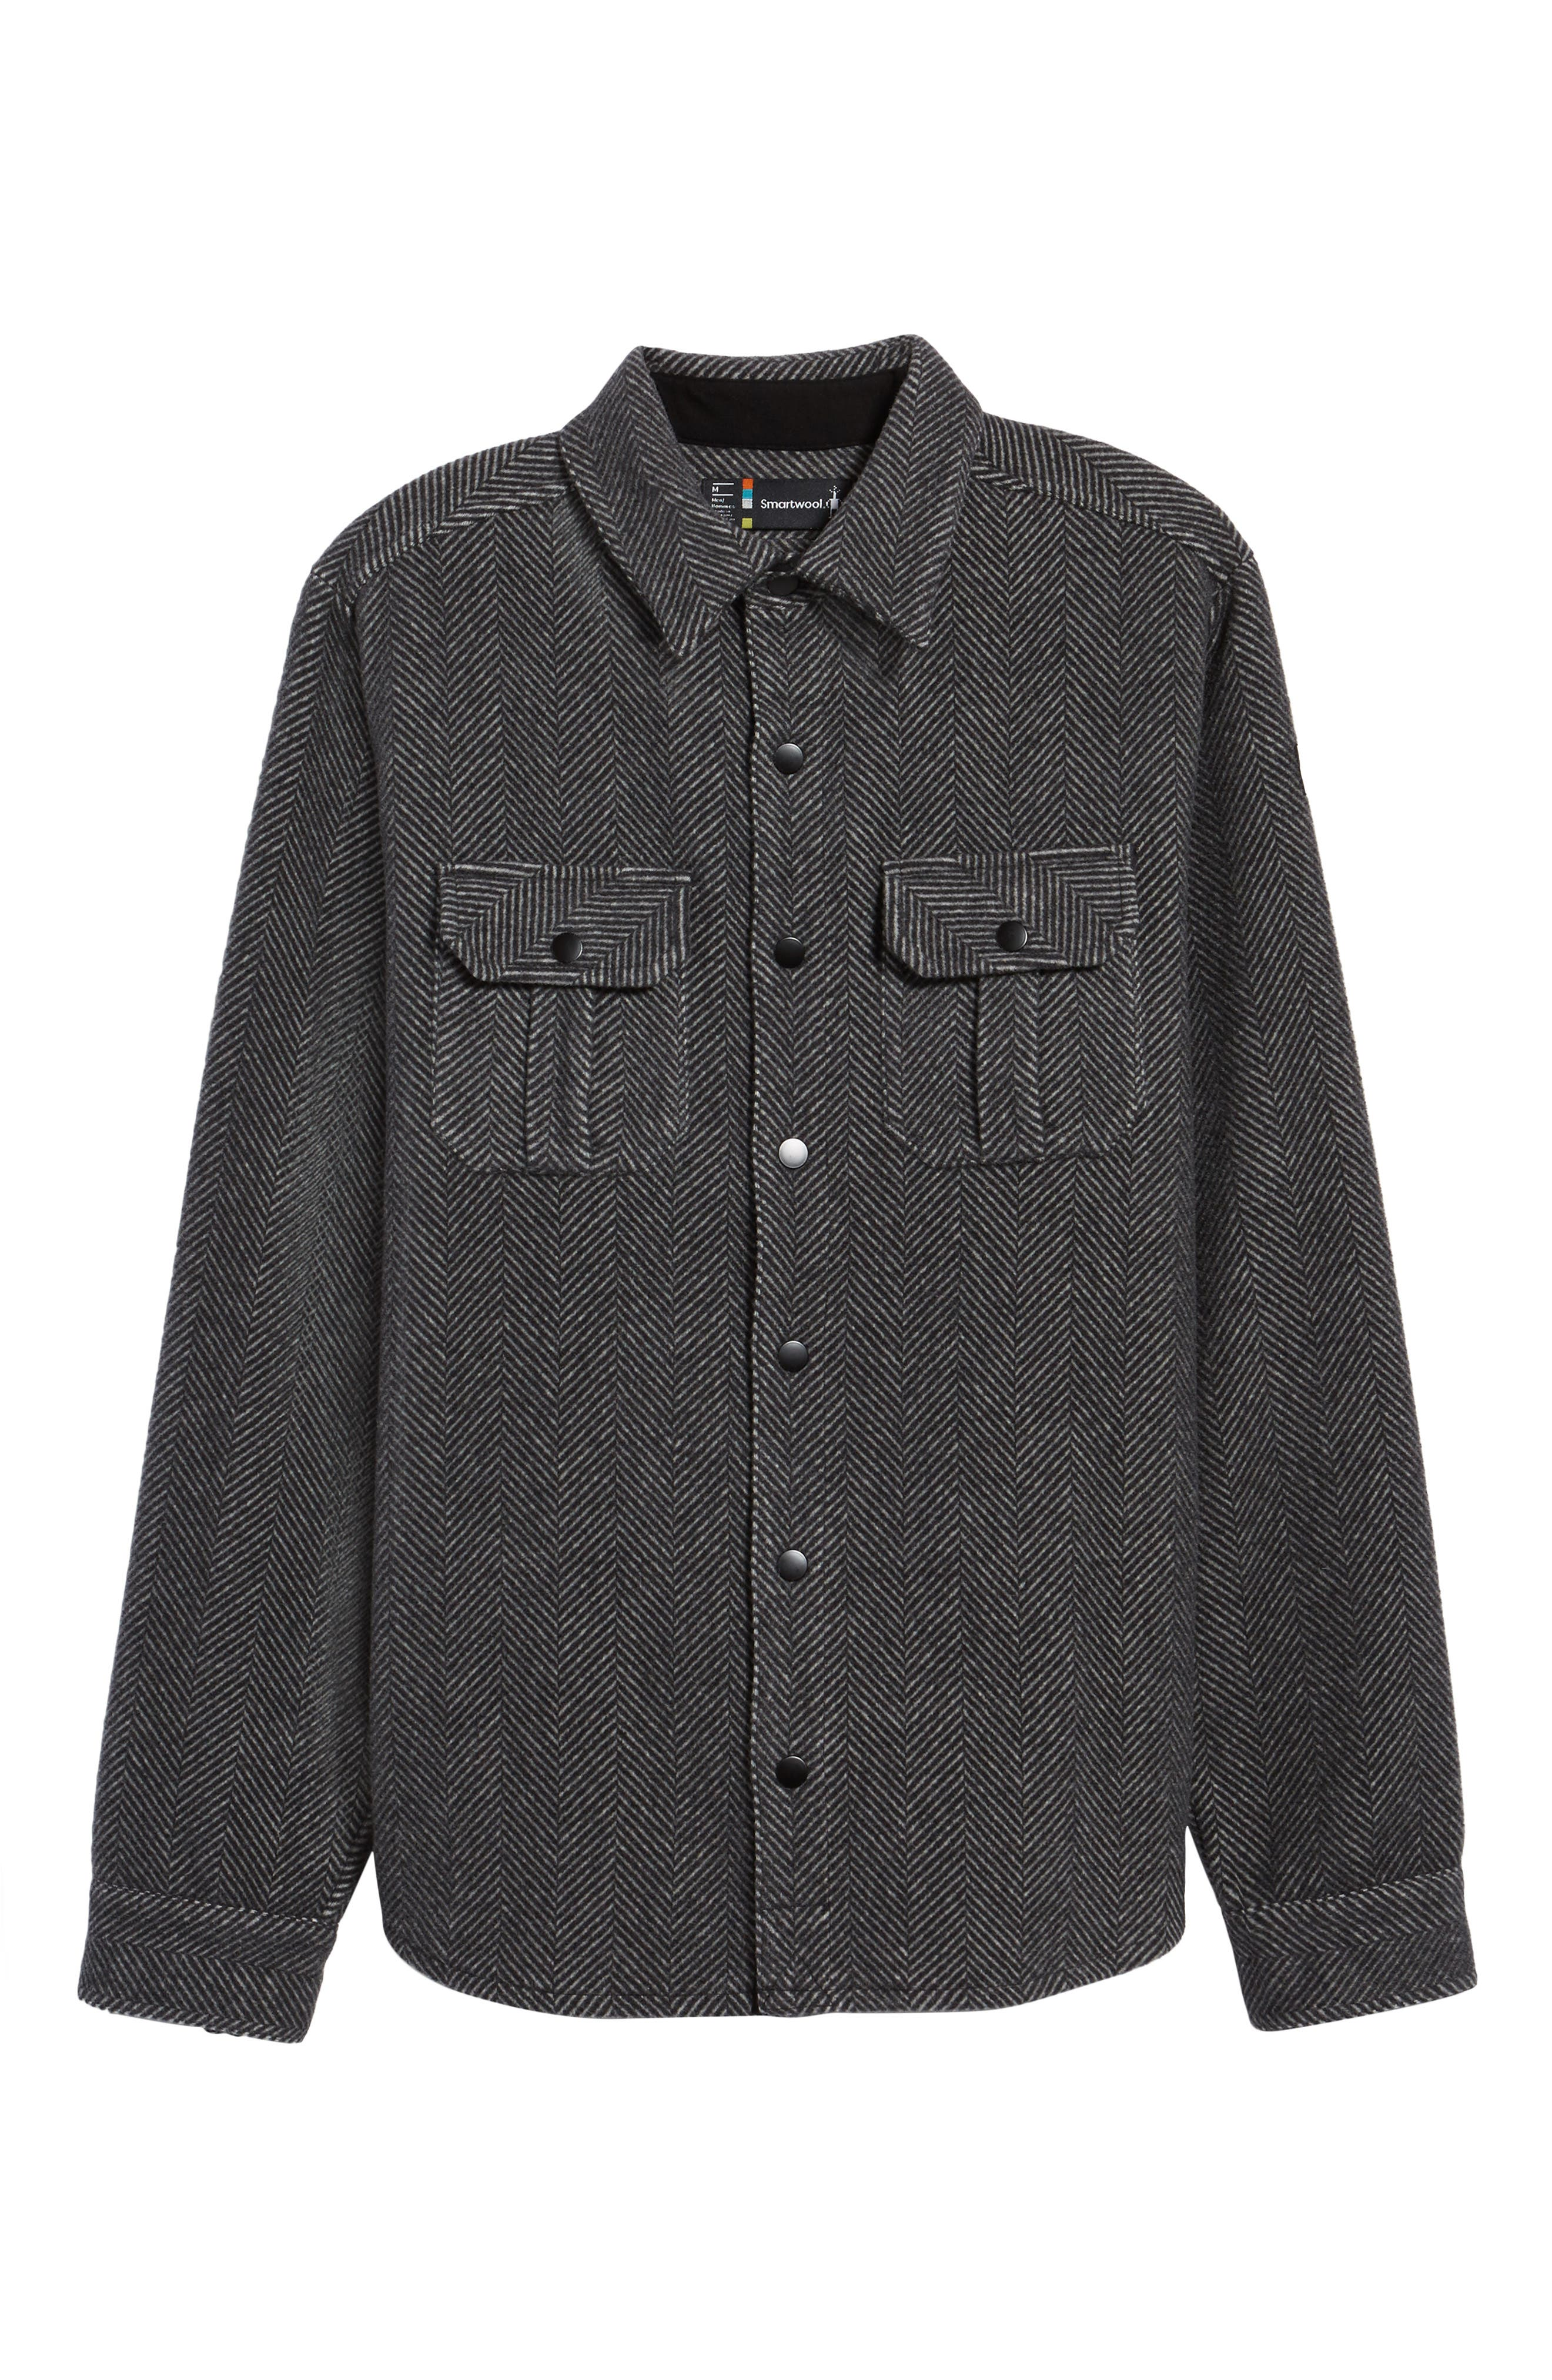 Anchor Line Herringbone Wool Blend Shirt Jacket,                             Alternate thumbnail 5, color,